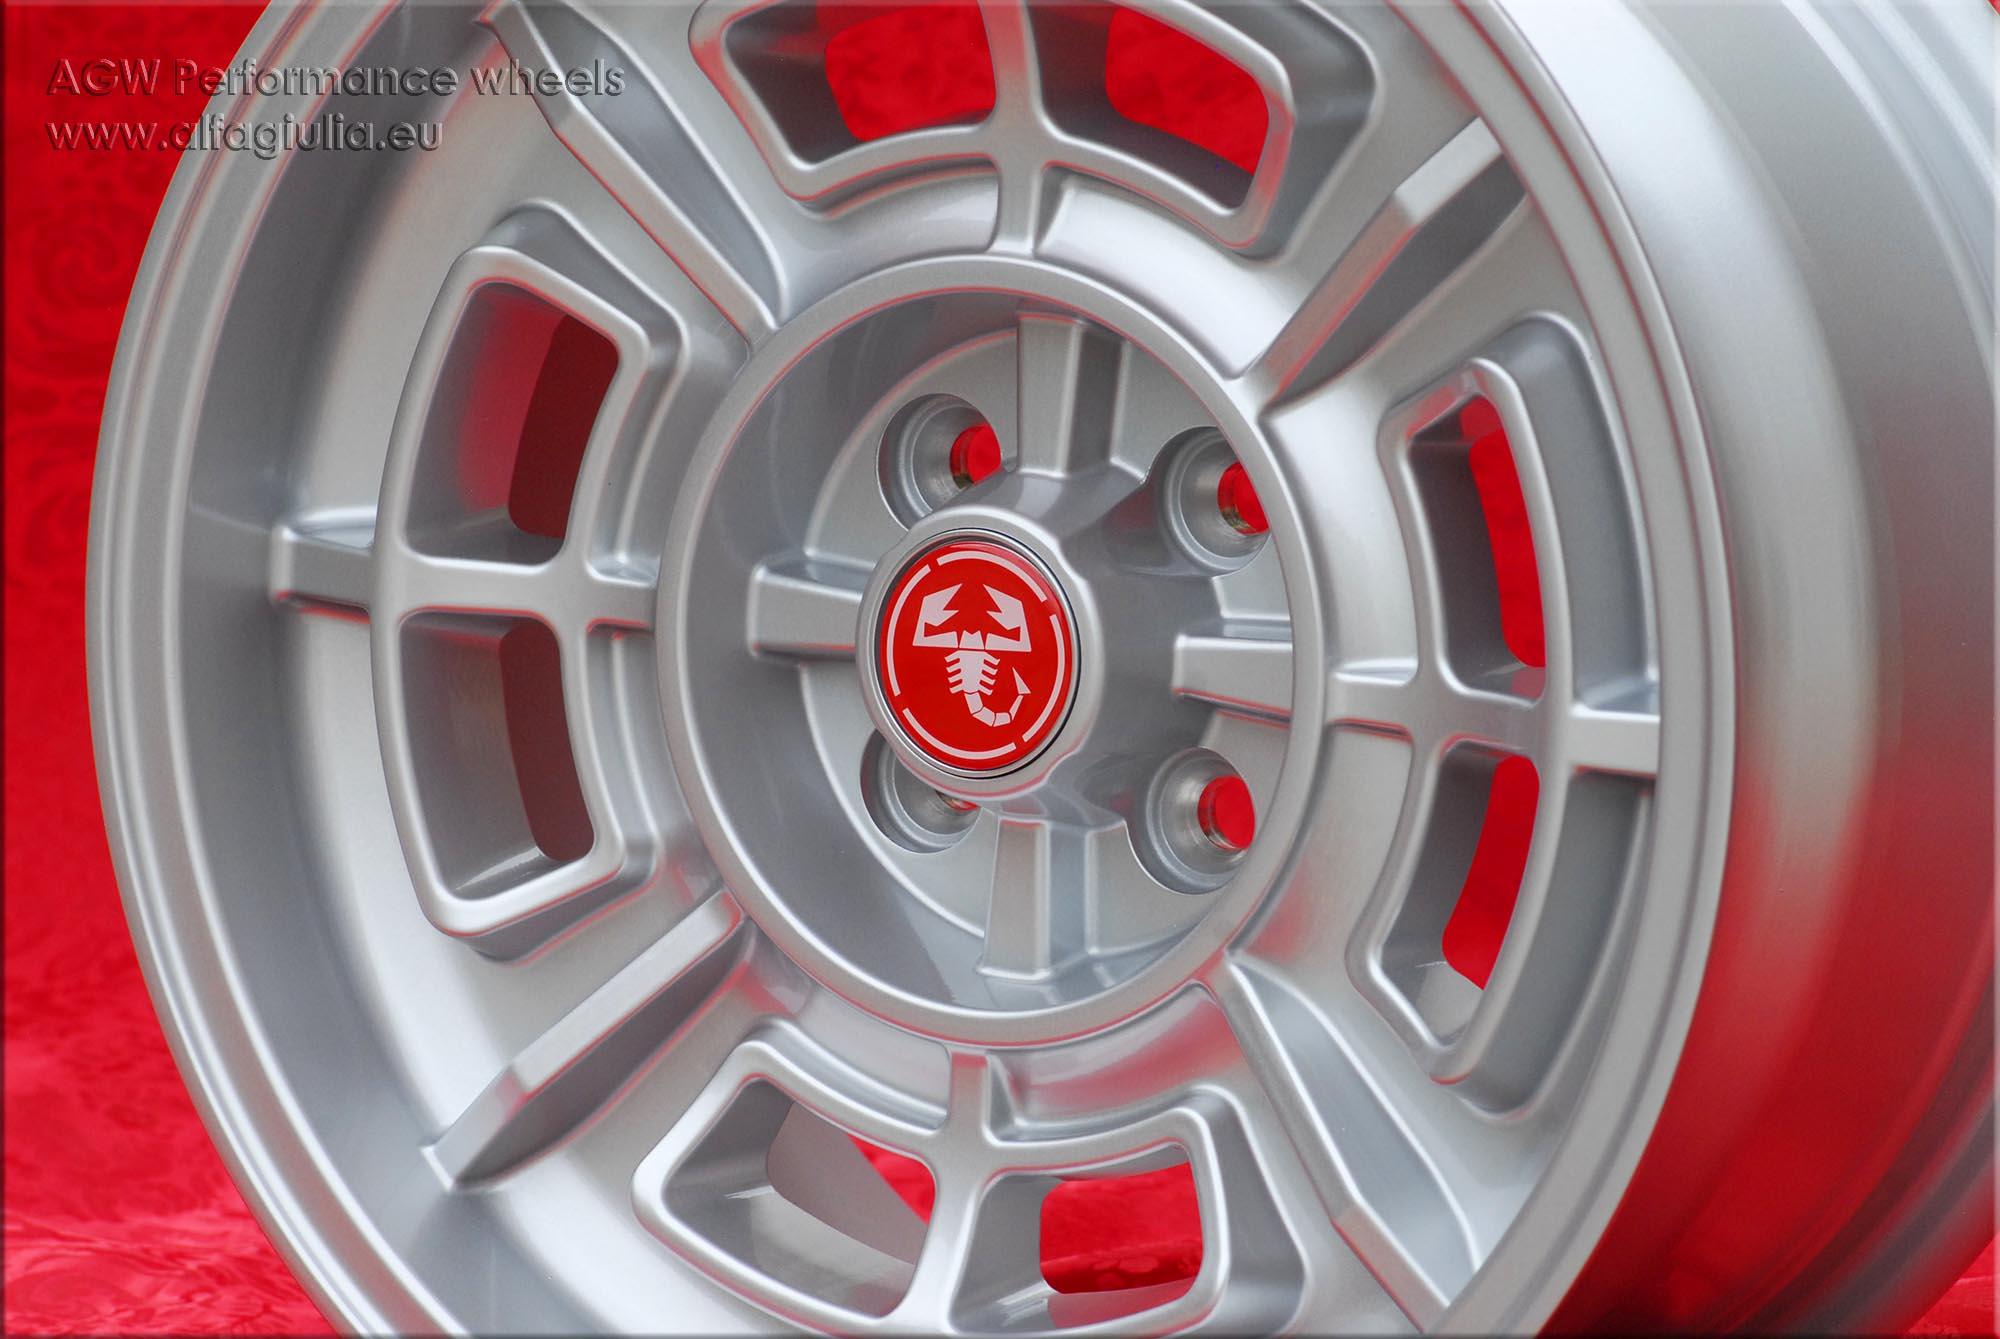 Fiat 124 Spider For Sale >> 4 Cerchi Fiat Cromodora CD68 7x15 4x98 Wheels Felgen ...